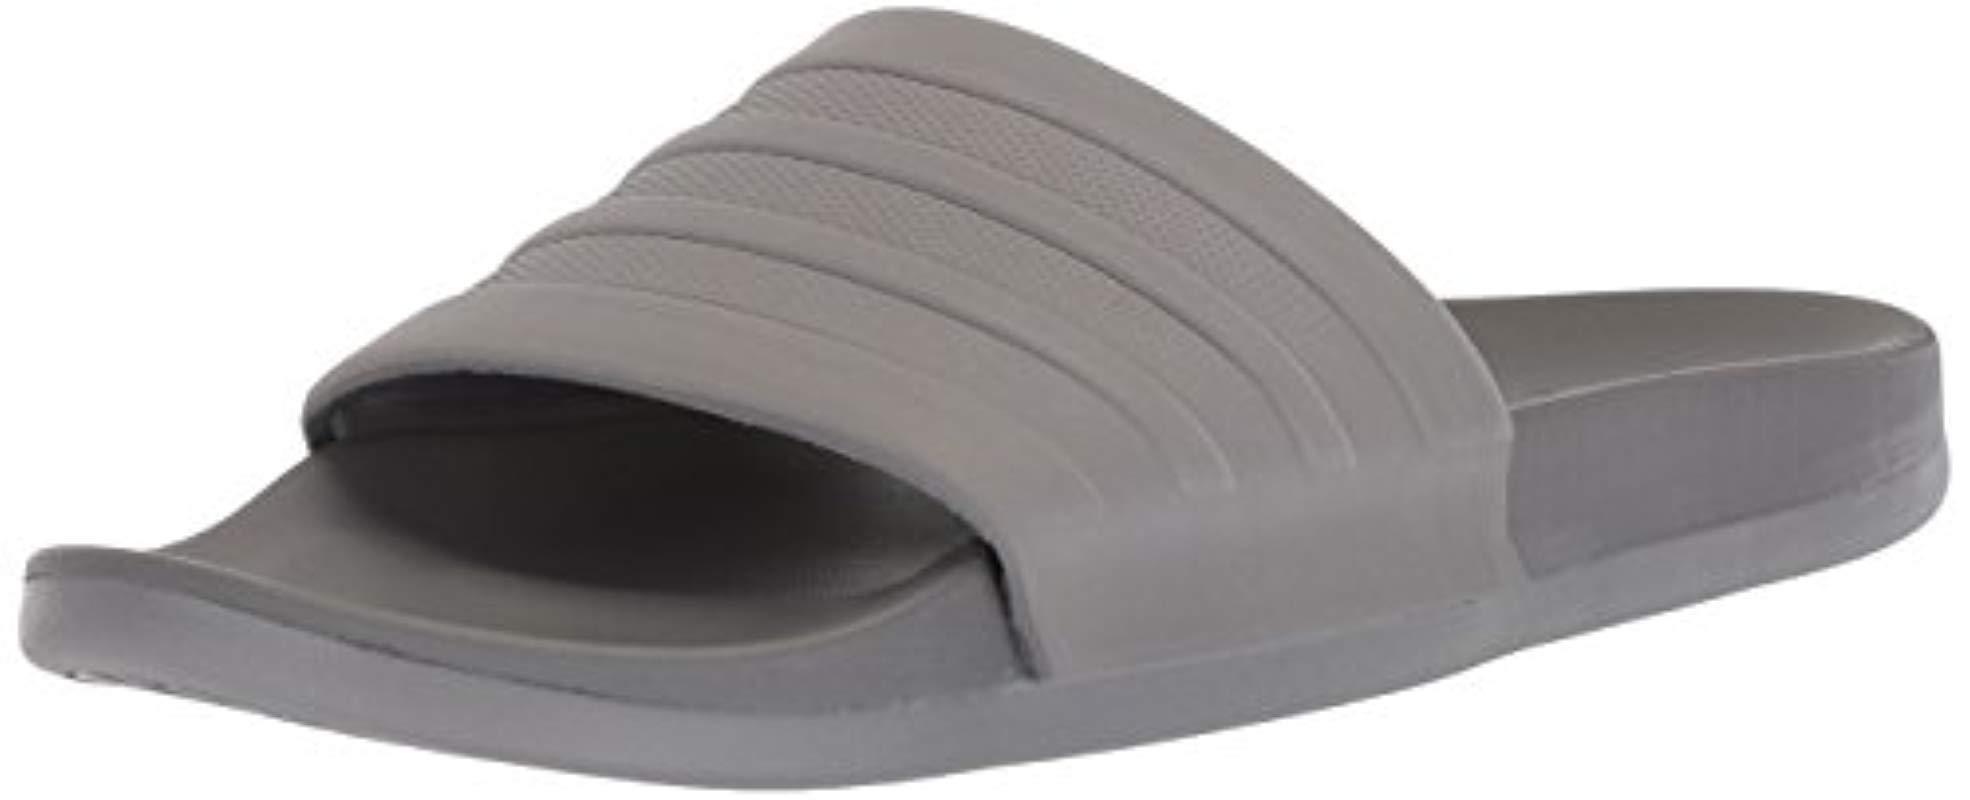 3fa4334bf312df Lyst - Adidas Originals Adidas Adilette Comfort Slide Sandal in Gray ...